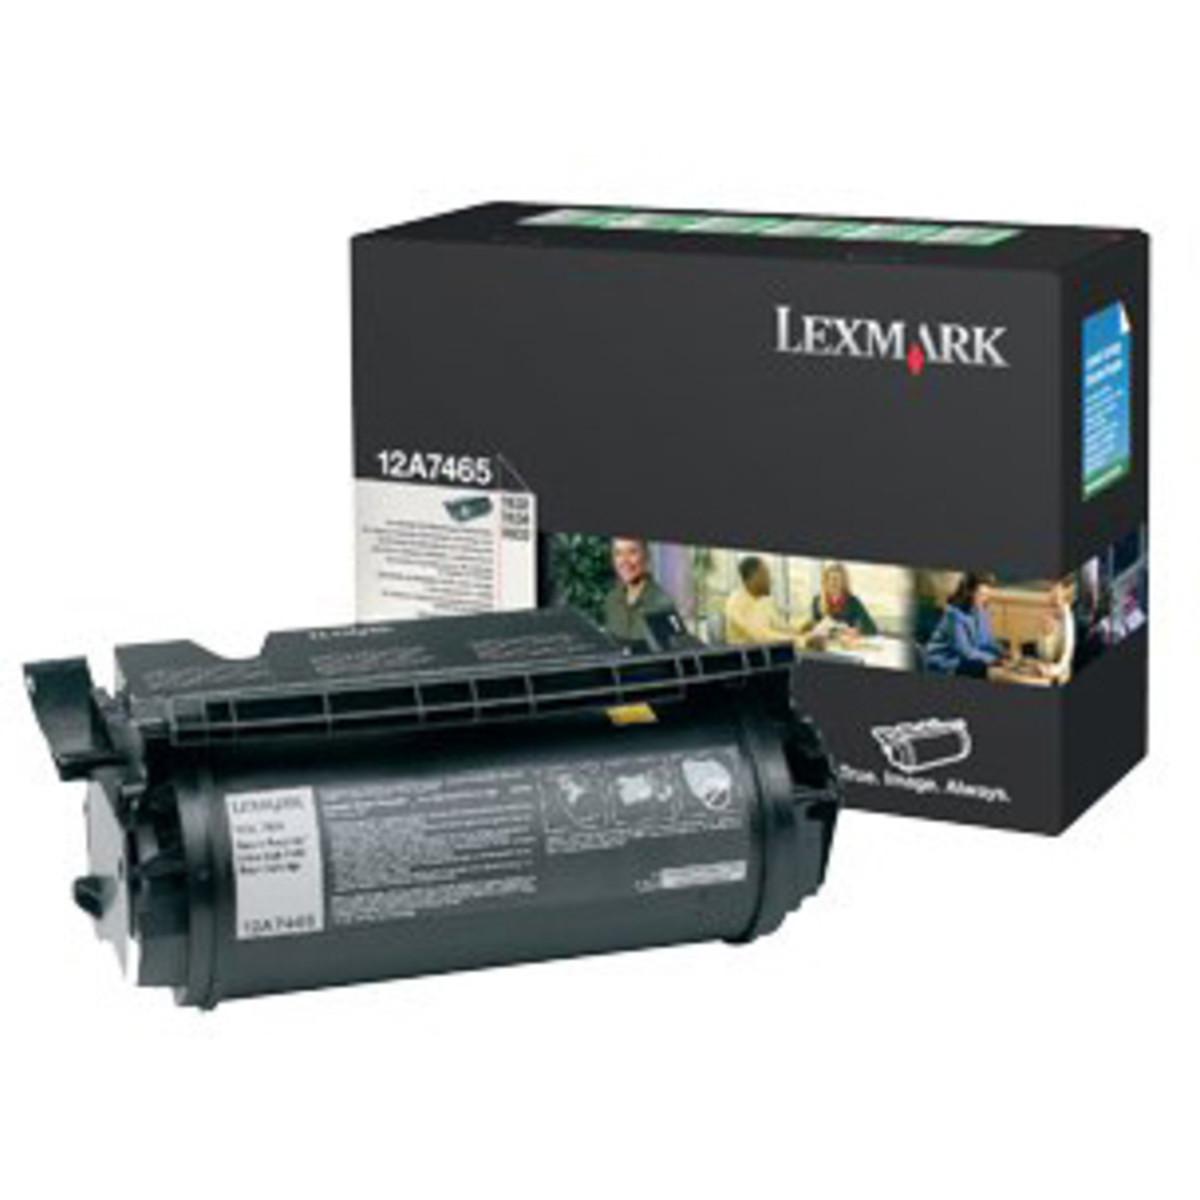 Lexmark 12A7465 Black Toner Cartridge